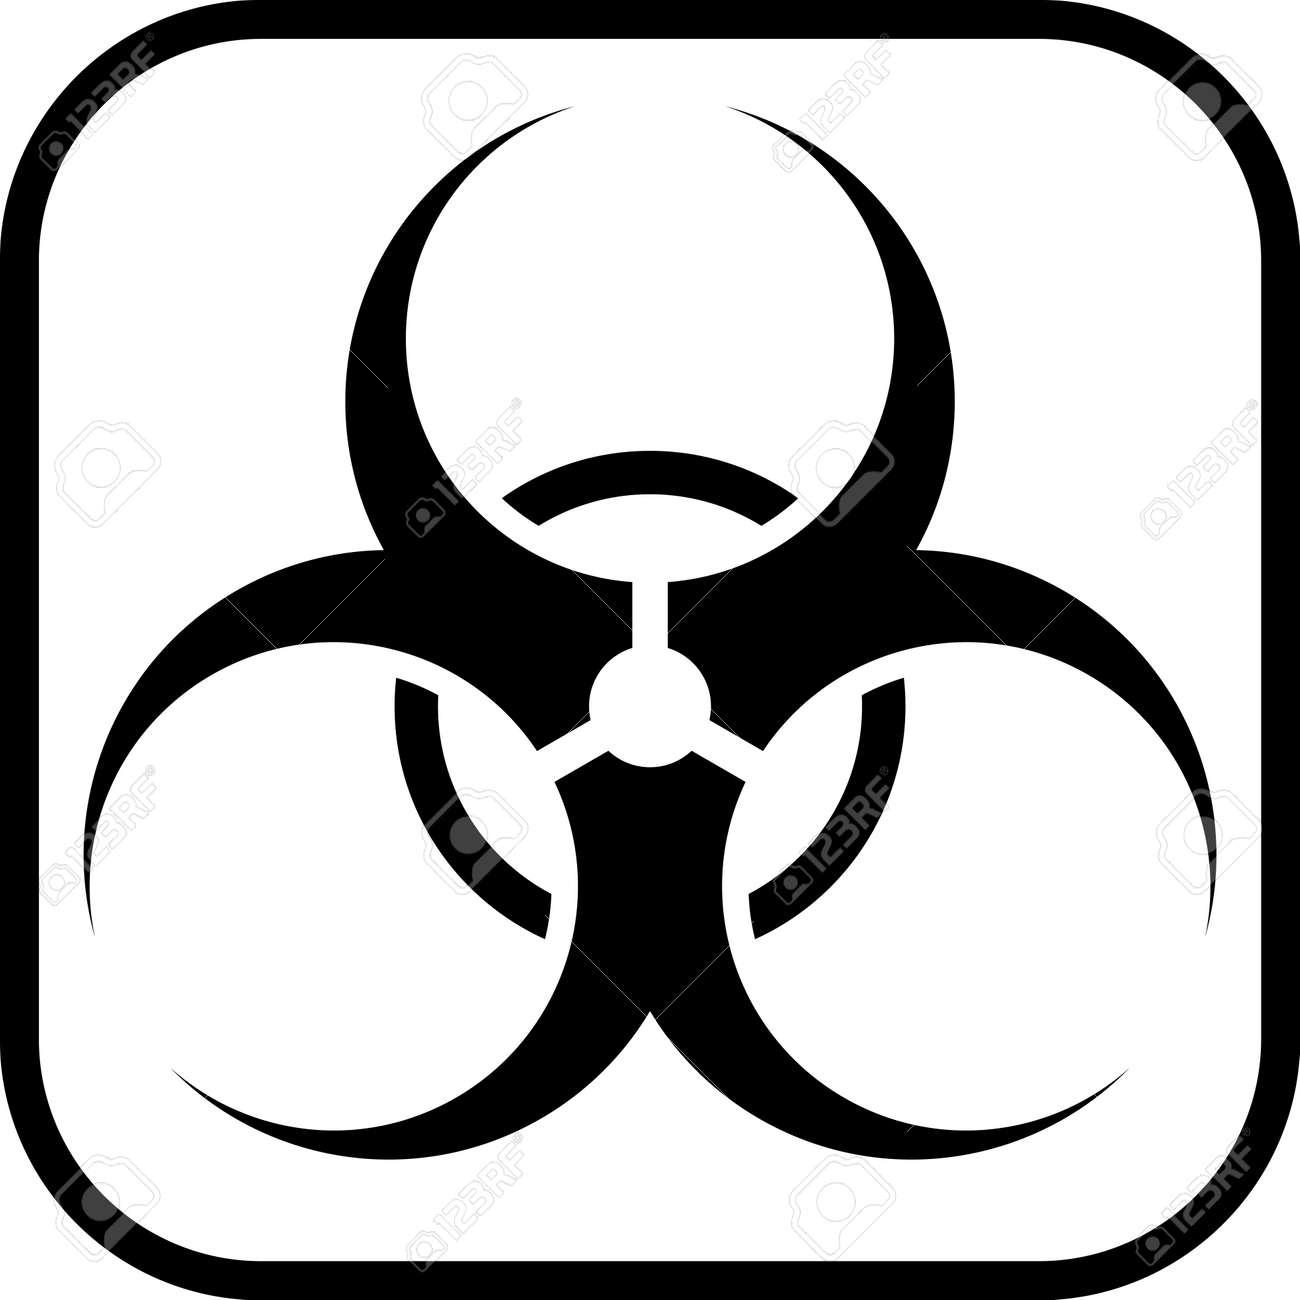 Biohazard symbol sign royalty free online floor plan builder biohazard symbol vector sign isolated royalty free cliparts 52831199 biohazard symbol vector sign isolated photo 52831199 biocorpaavc Images